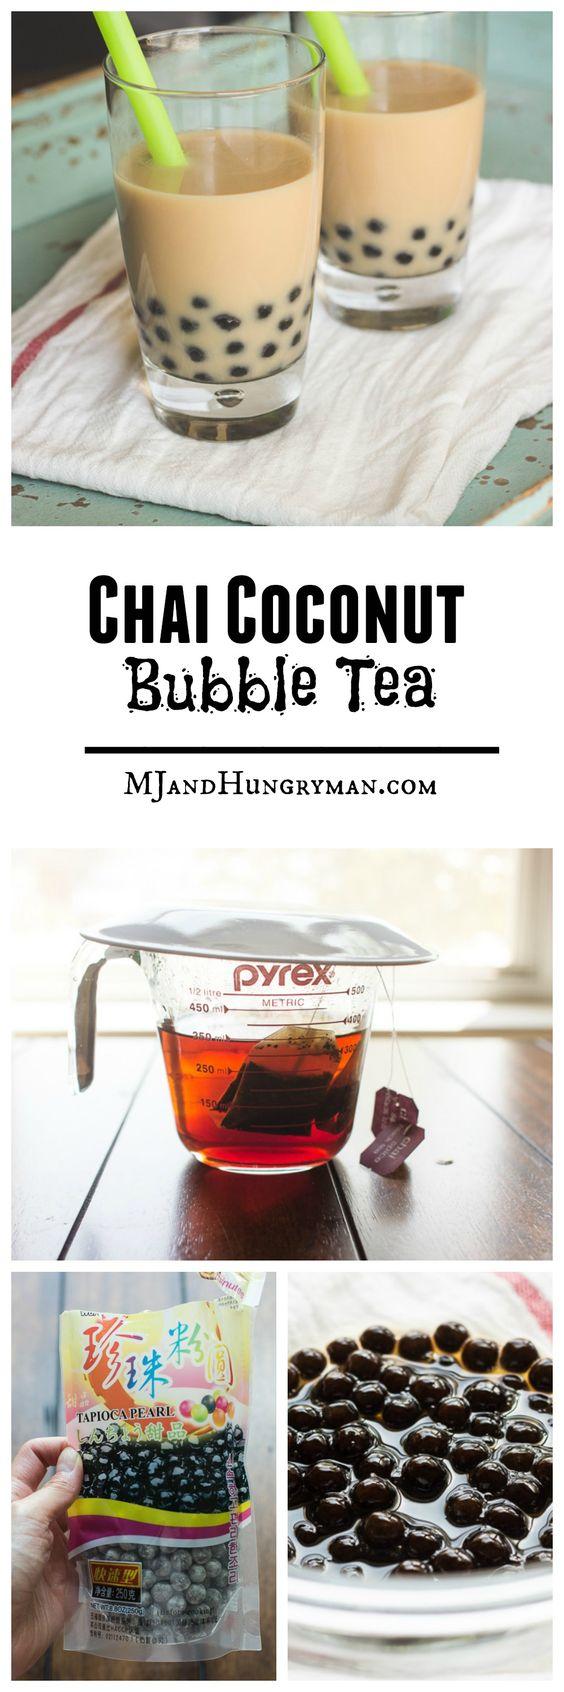 Chai Coconut Bubble Tea // MJ and Hungryman